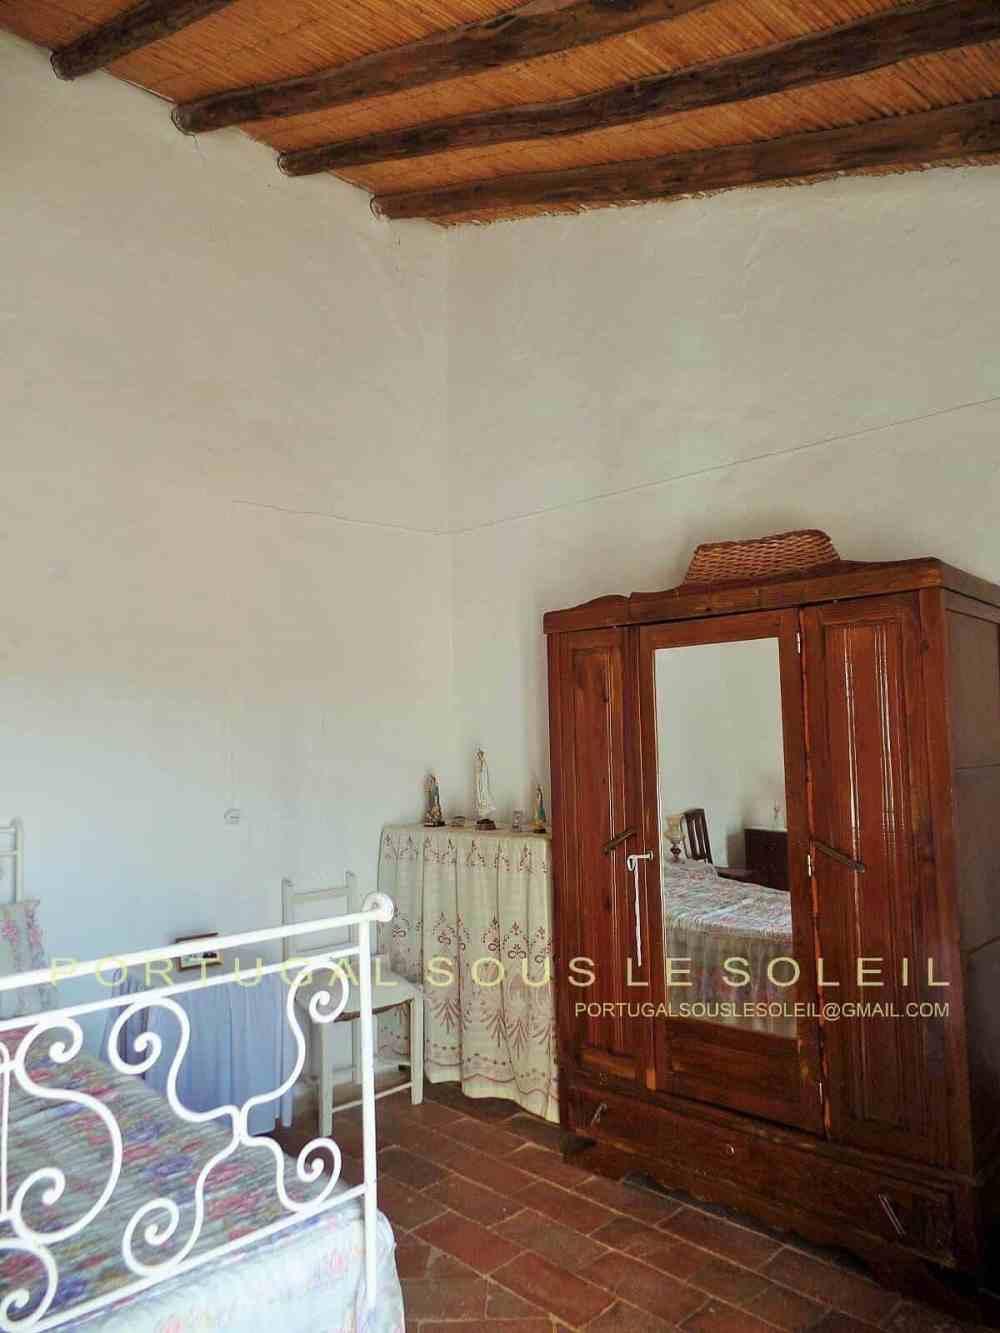 Portugal Sous Le Soleil – Property Real Estate